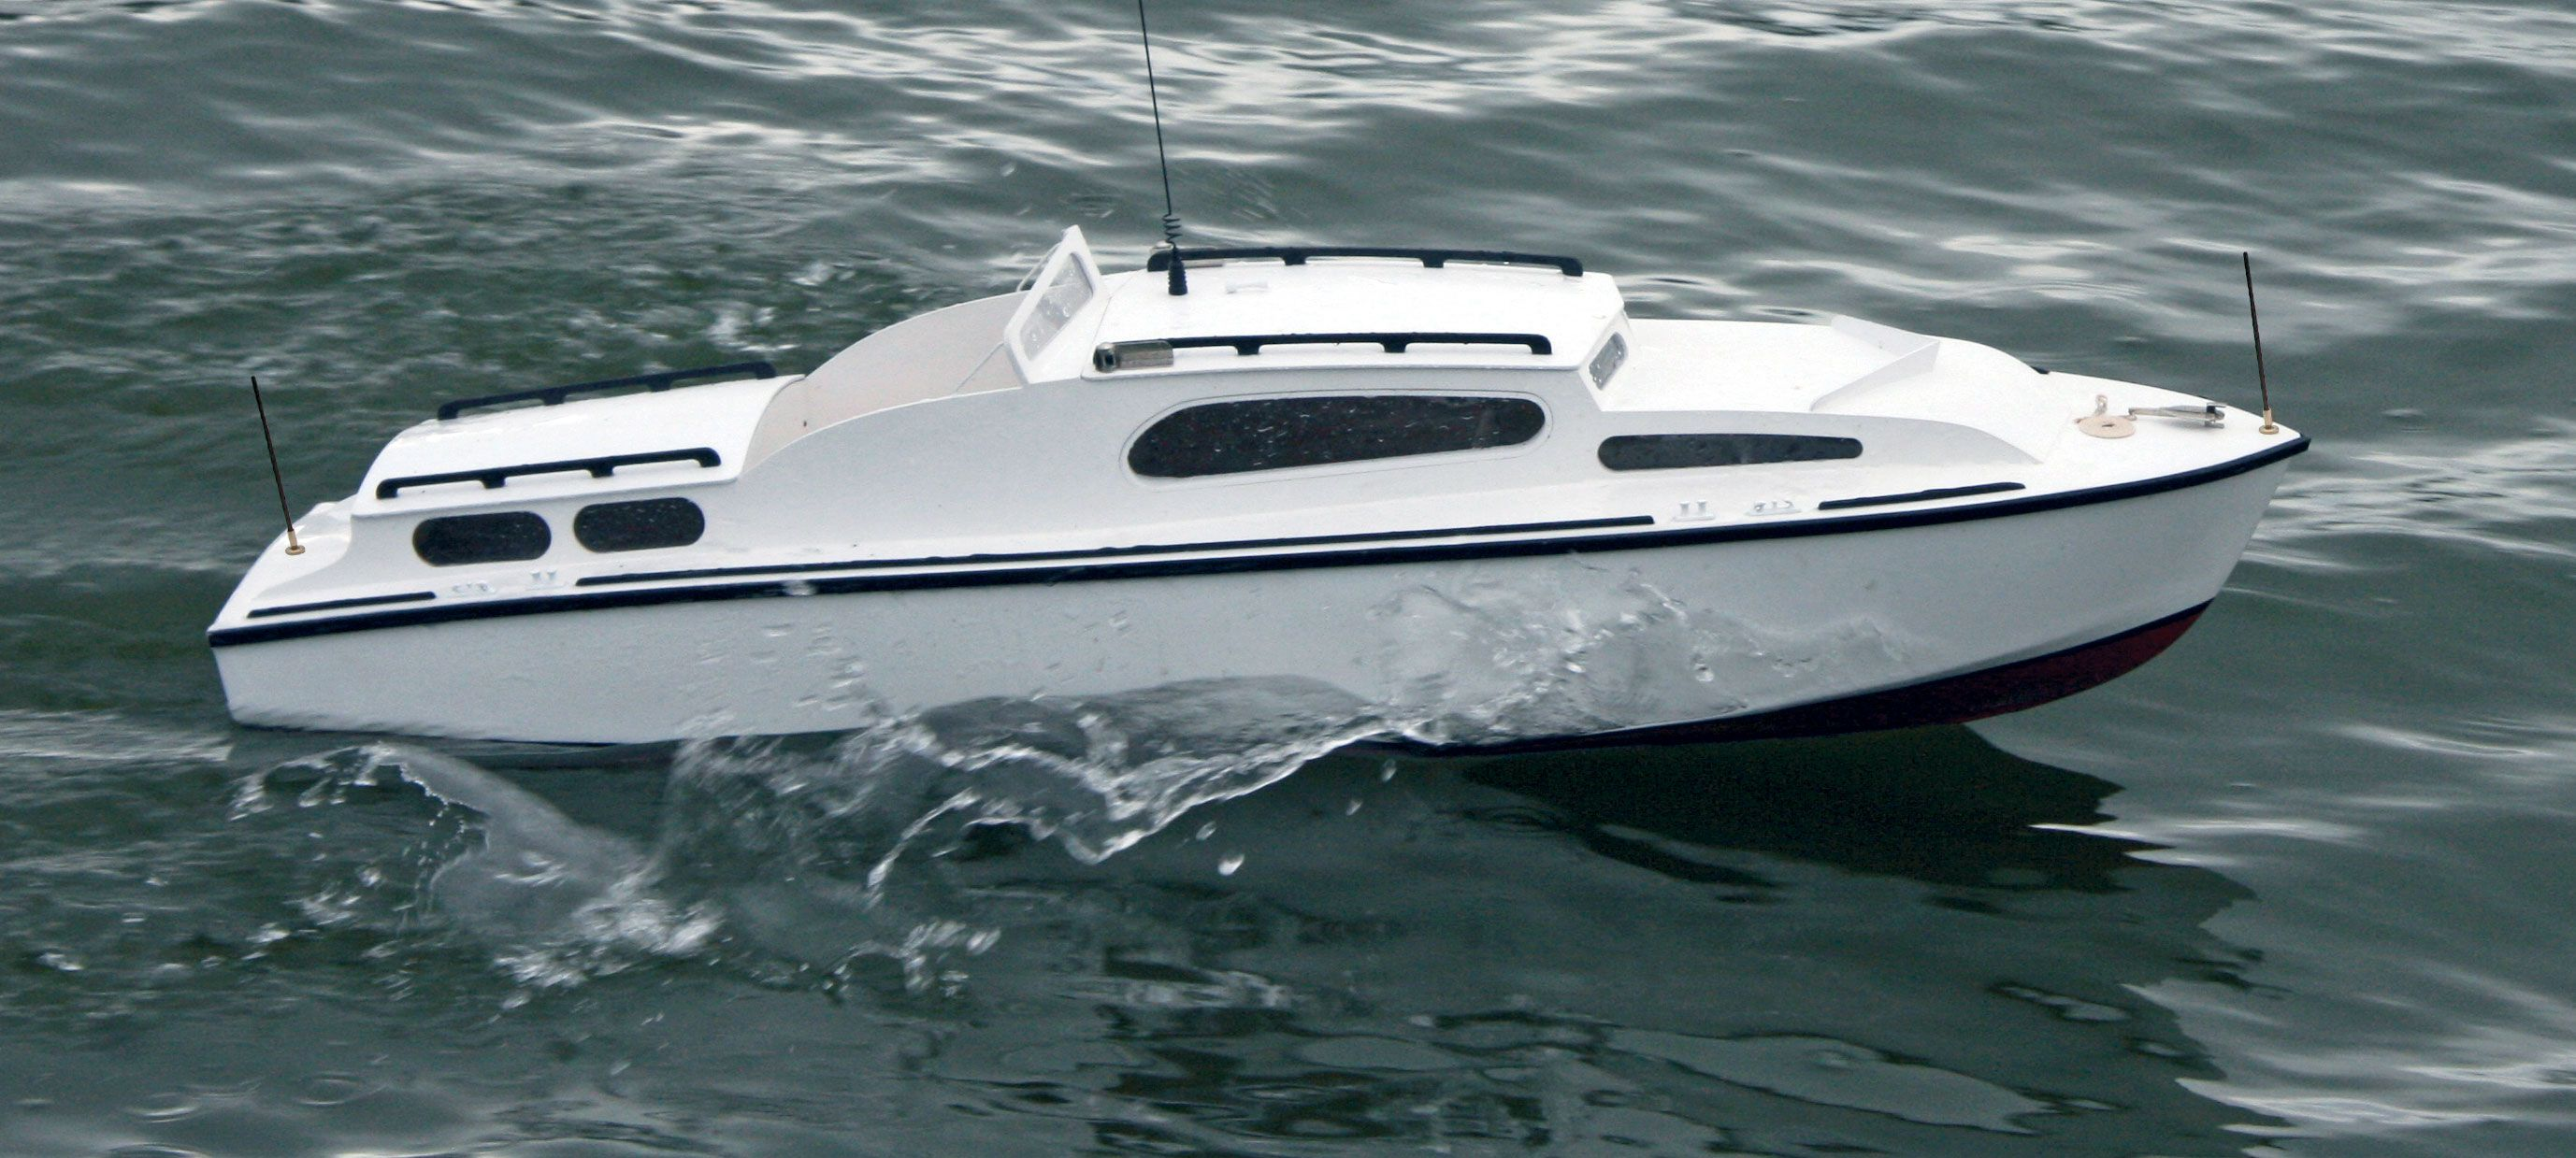 Beau Aerokits Sea Commander Cabin Cruiser Kit